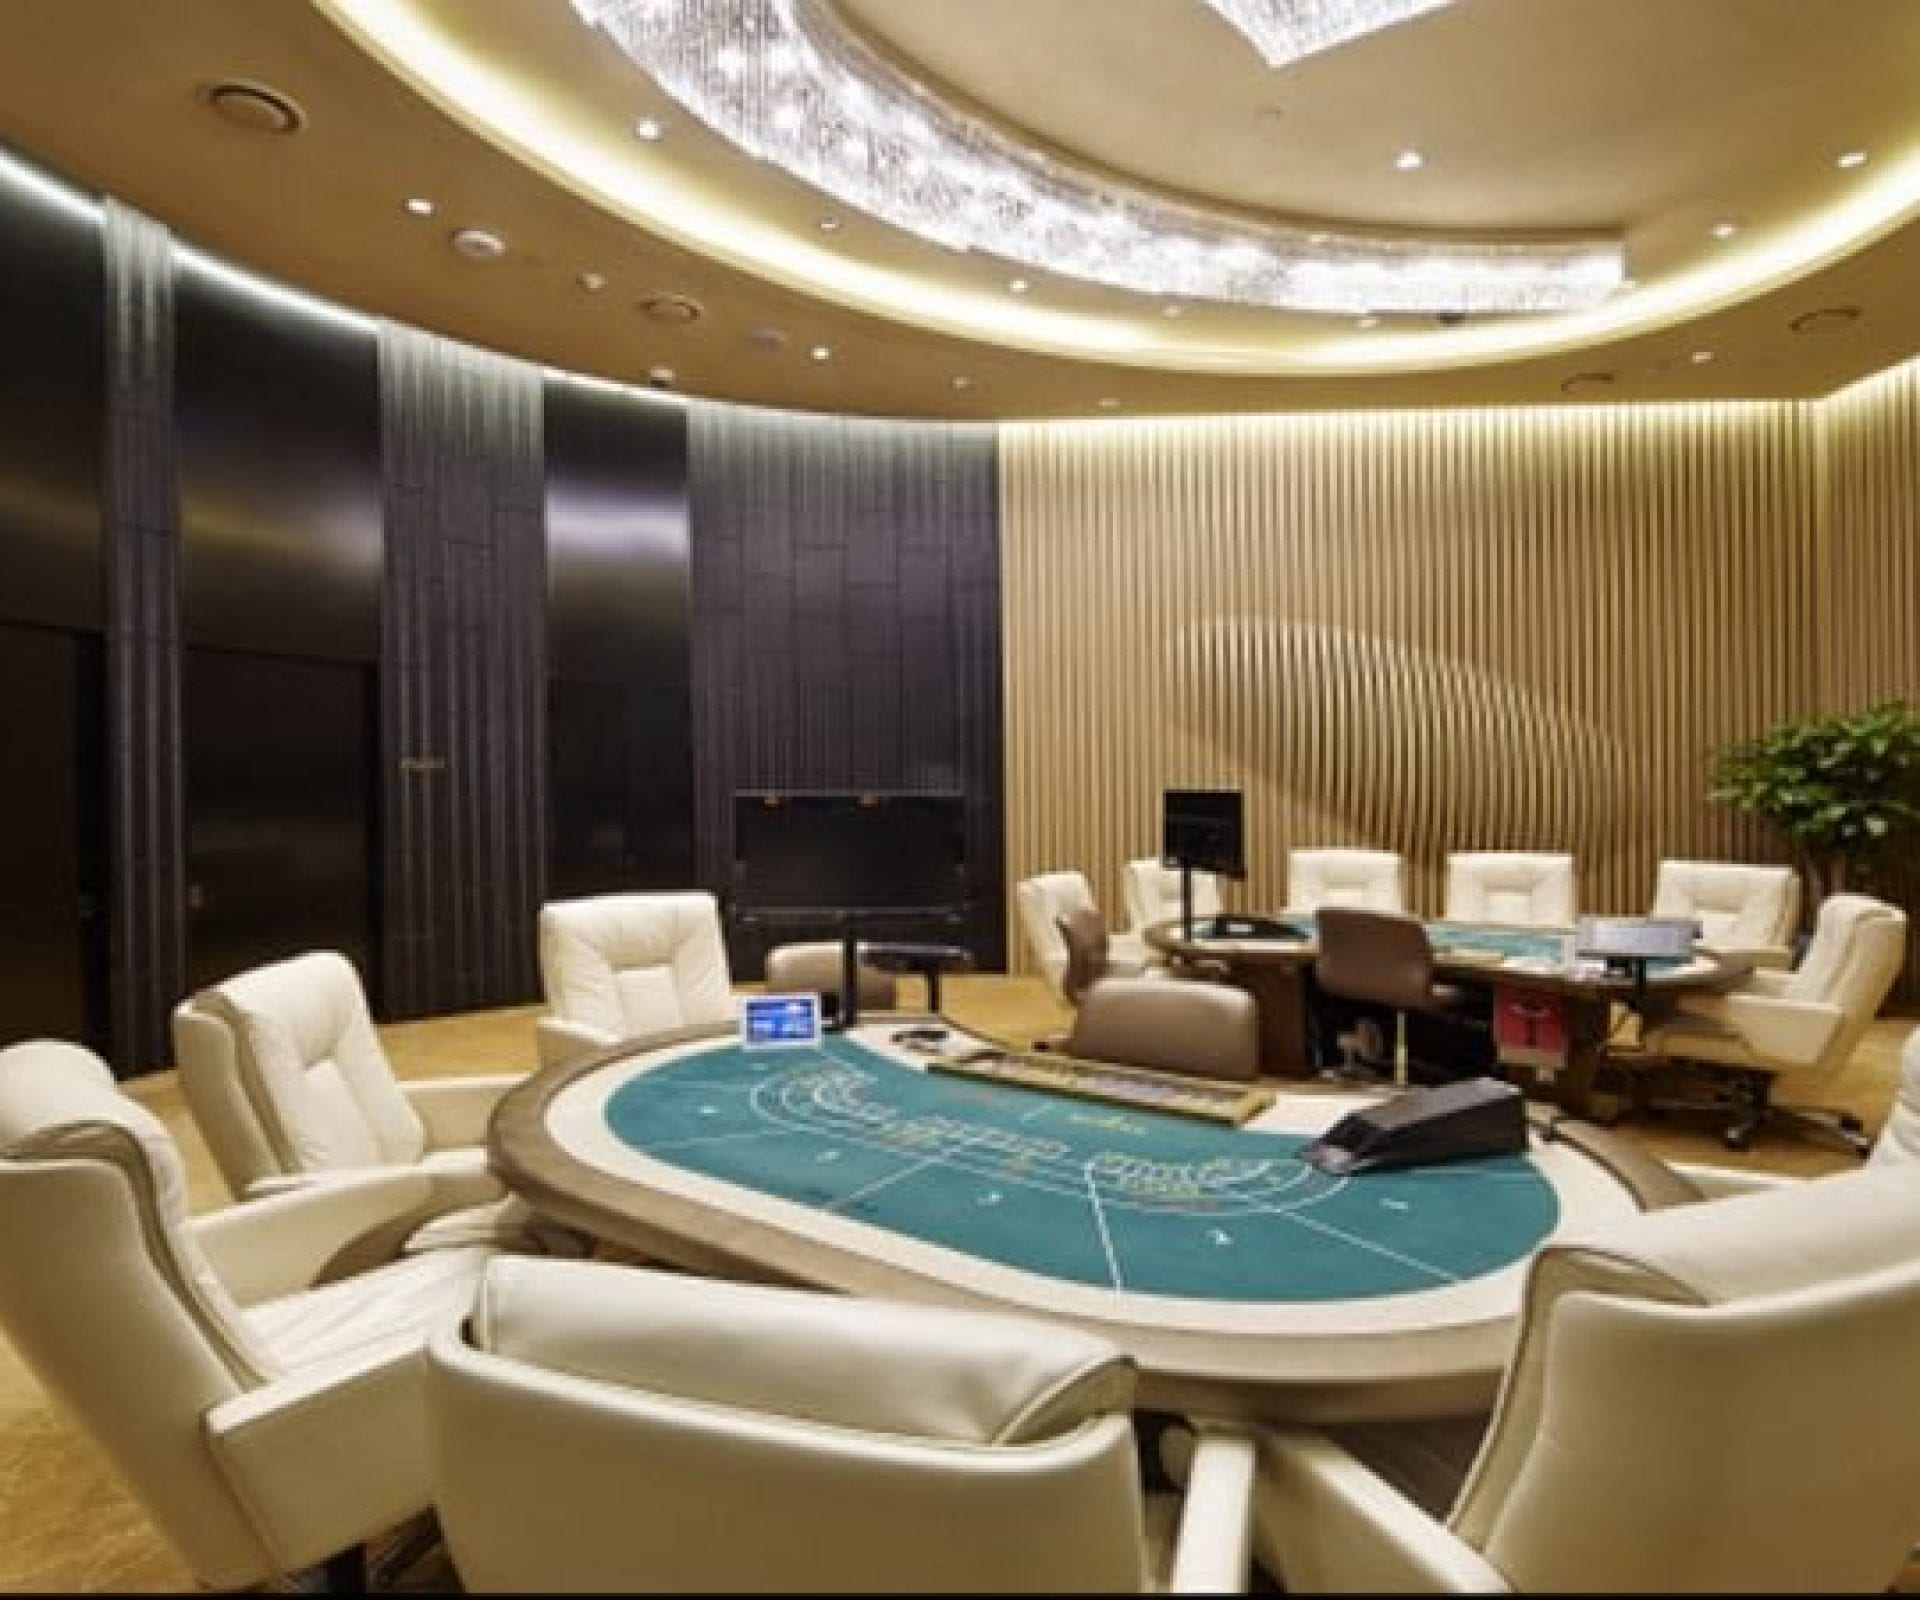 Seven Luck Casino Hilton | Millennium Hilton Hotel, Seoul